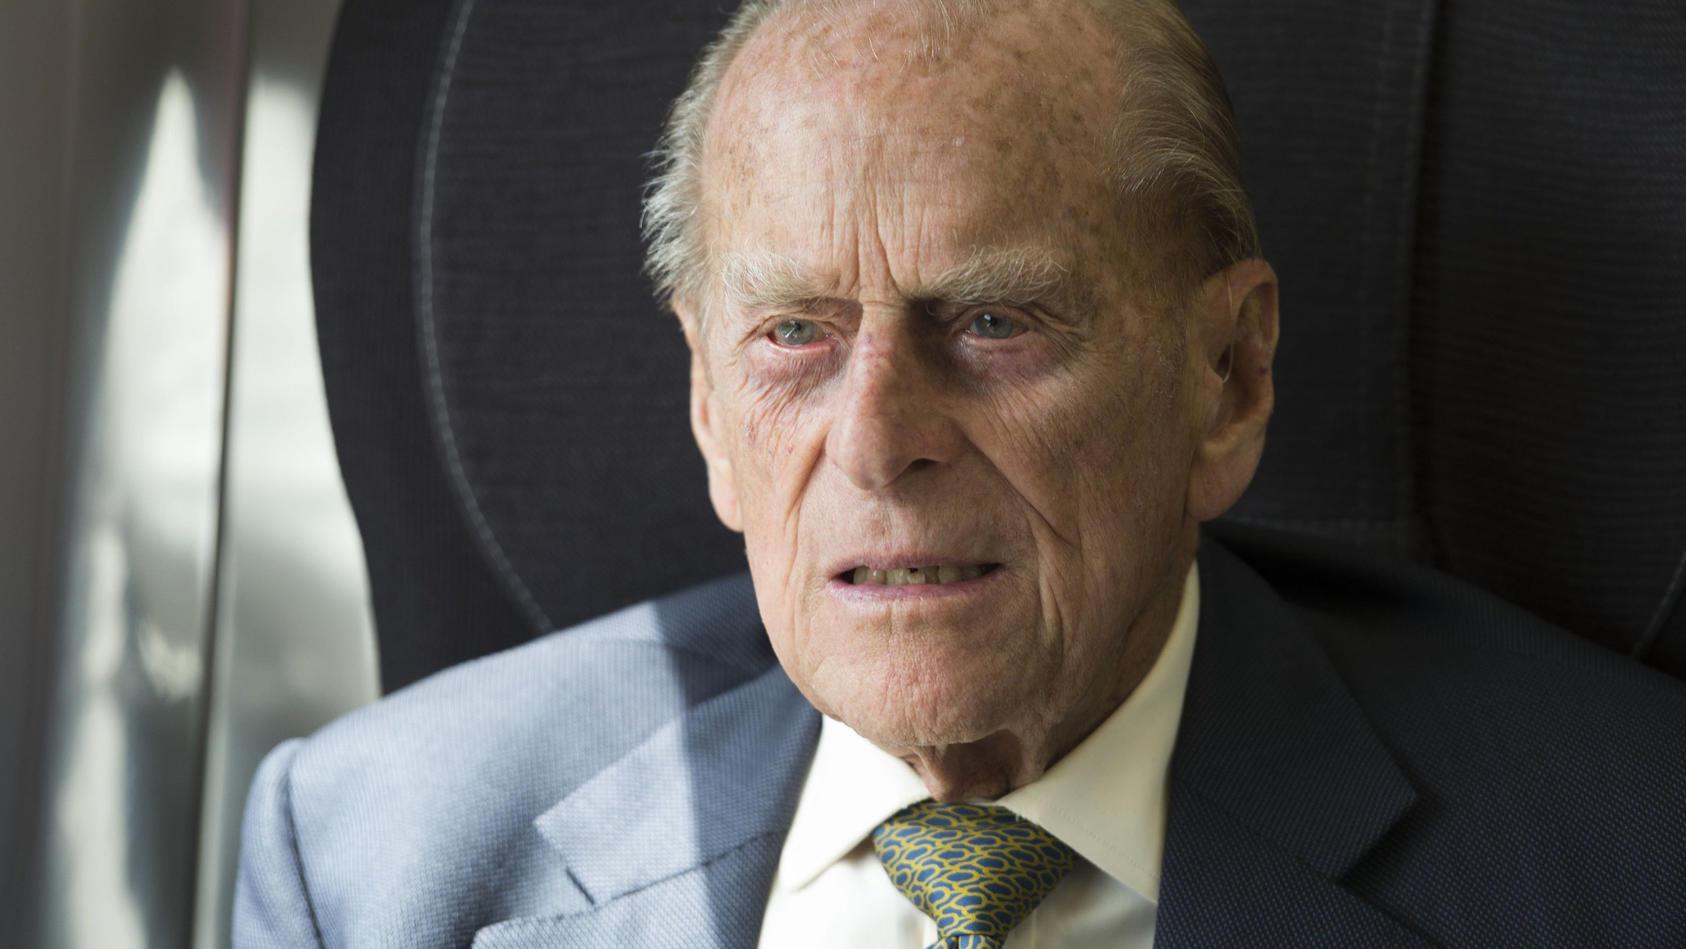 Prinz Philip in anderes Krankenhaus verlegt (Archivbild)